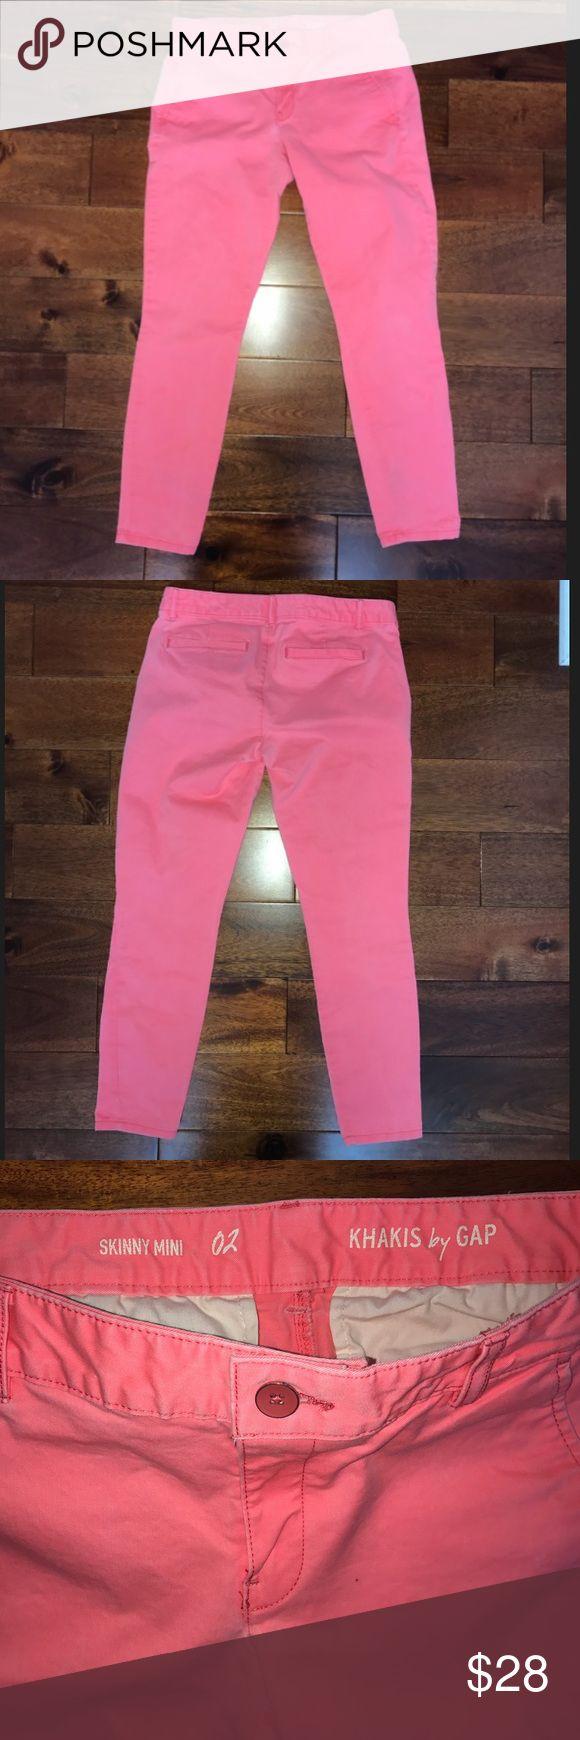 GAP Peach Pink Skinny Jeans GAP Peach Pink Skinny Jeans. Worn once! GAP Jeans Skinny